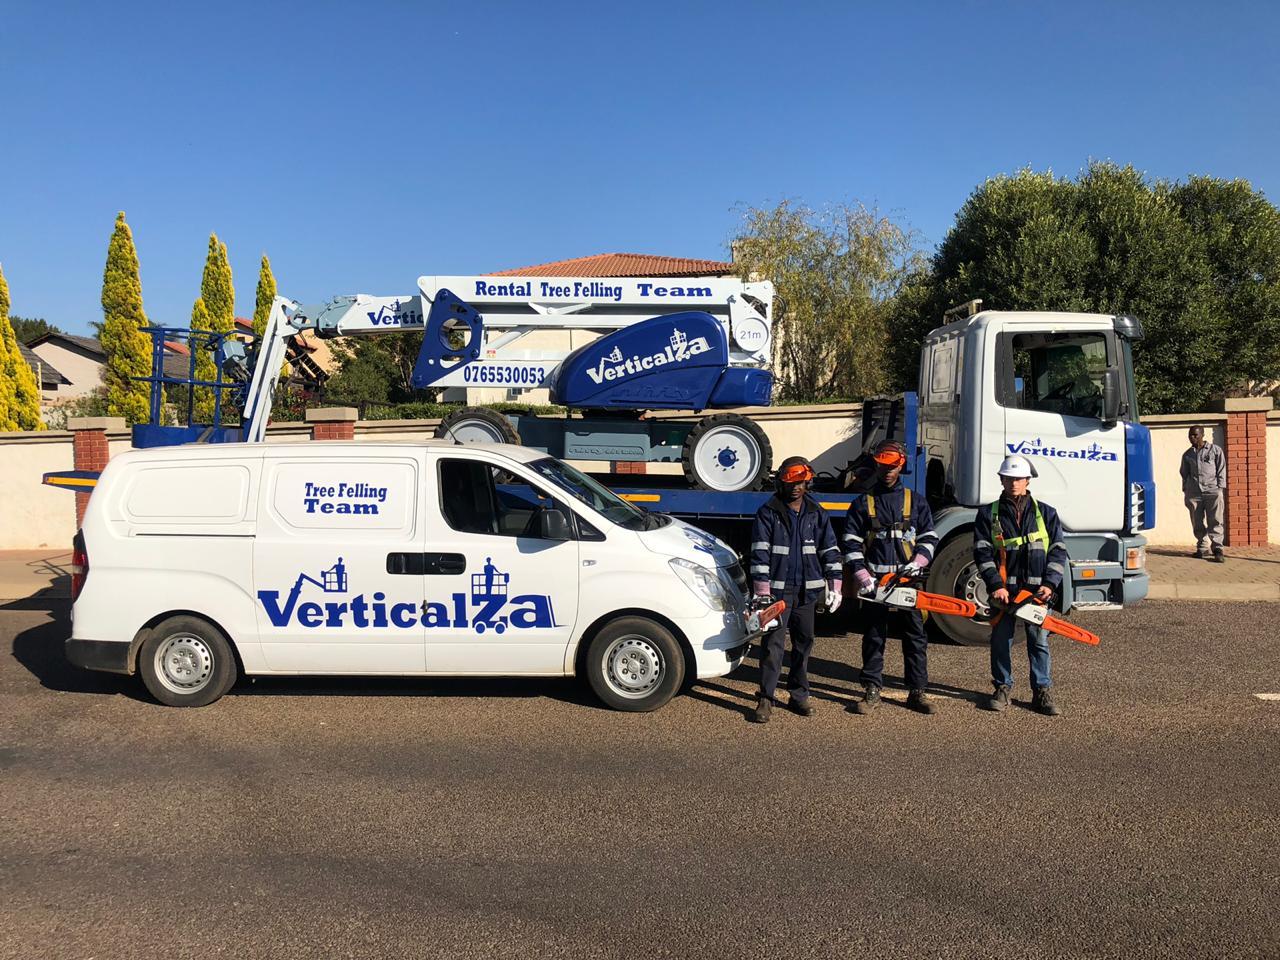 VerticalZA – Tree Felling & High Pressure Cleaning